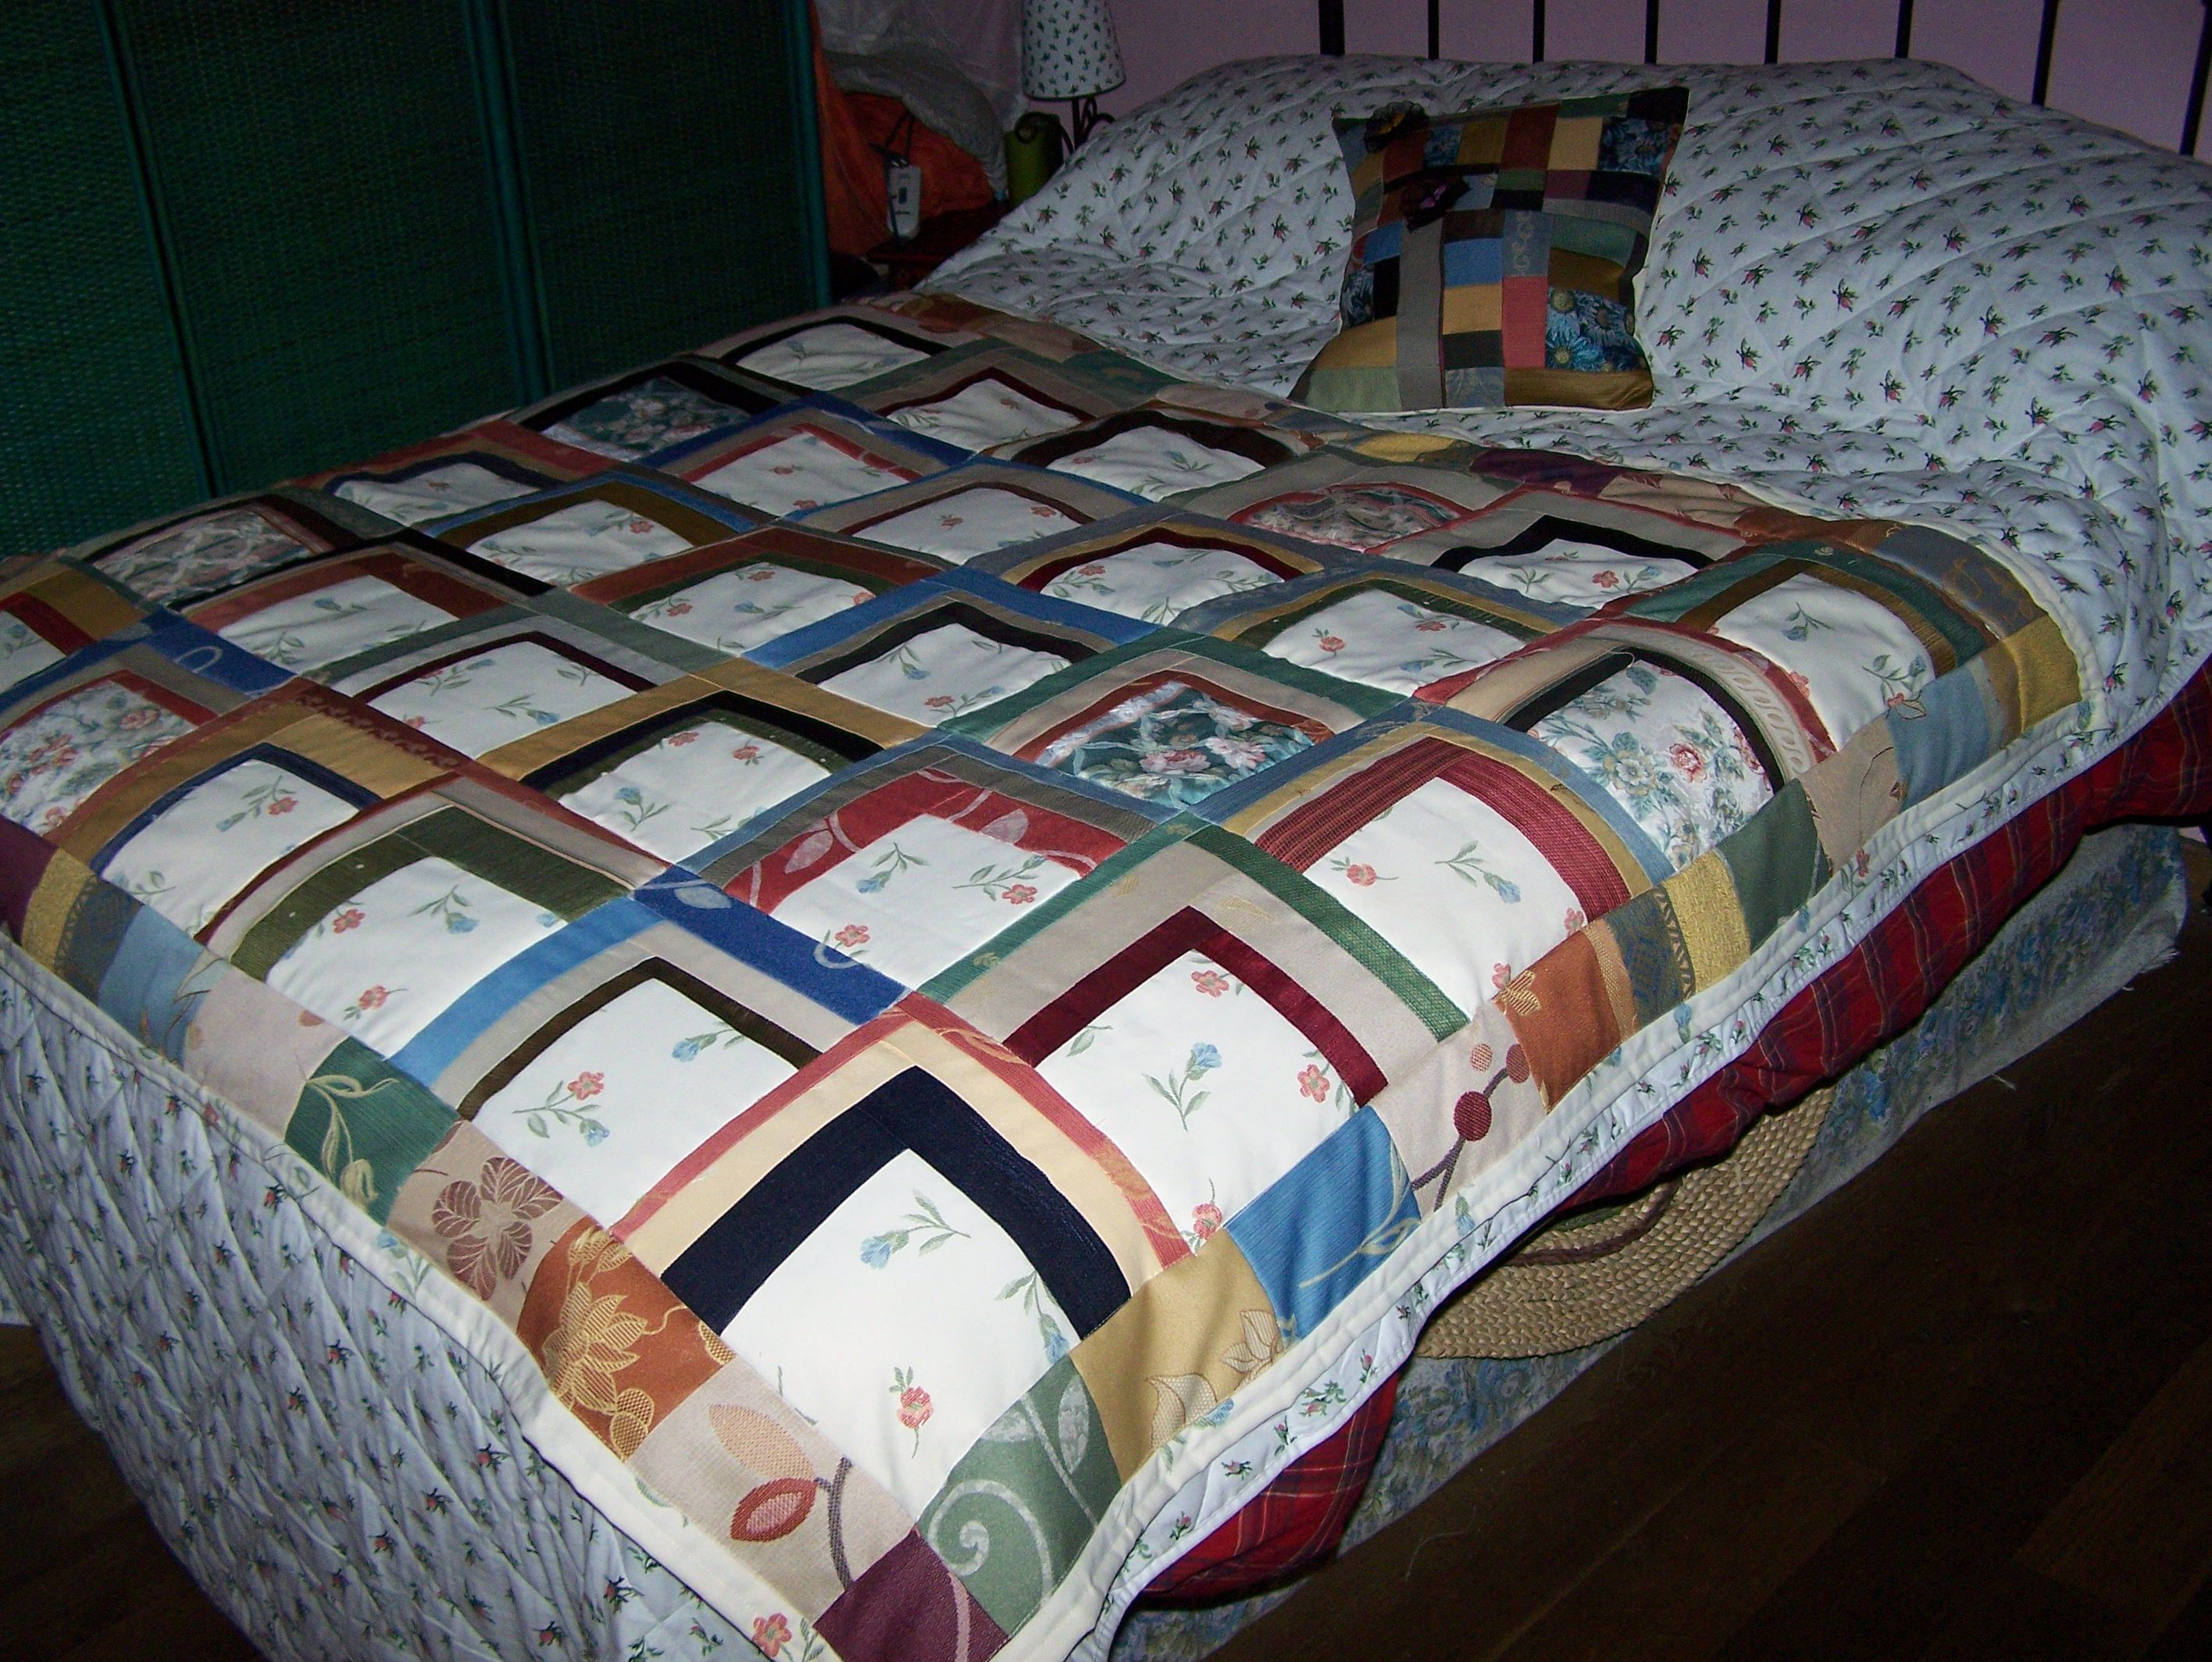 Colcha de retazos de telas para tapizar patchworksasa - Tela para colchas ...